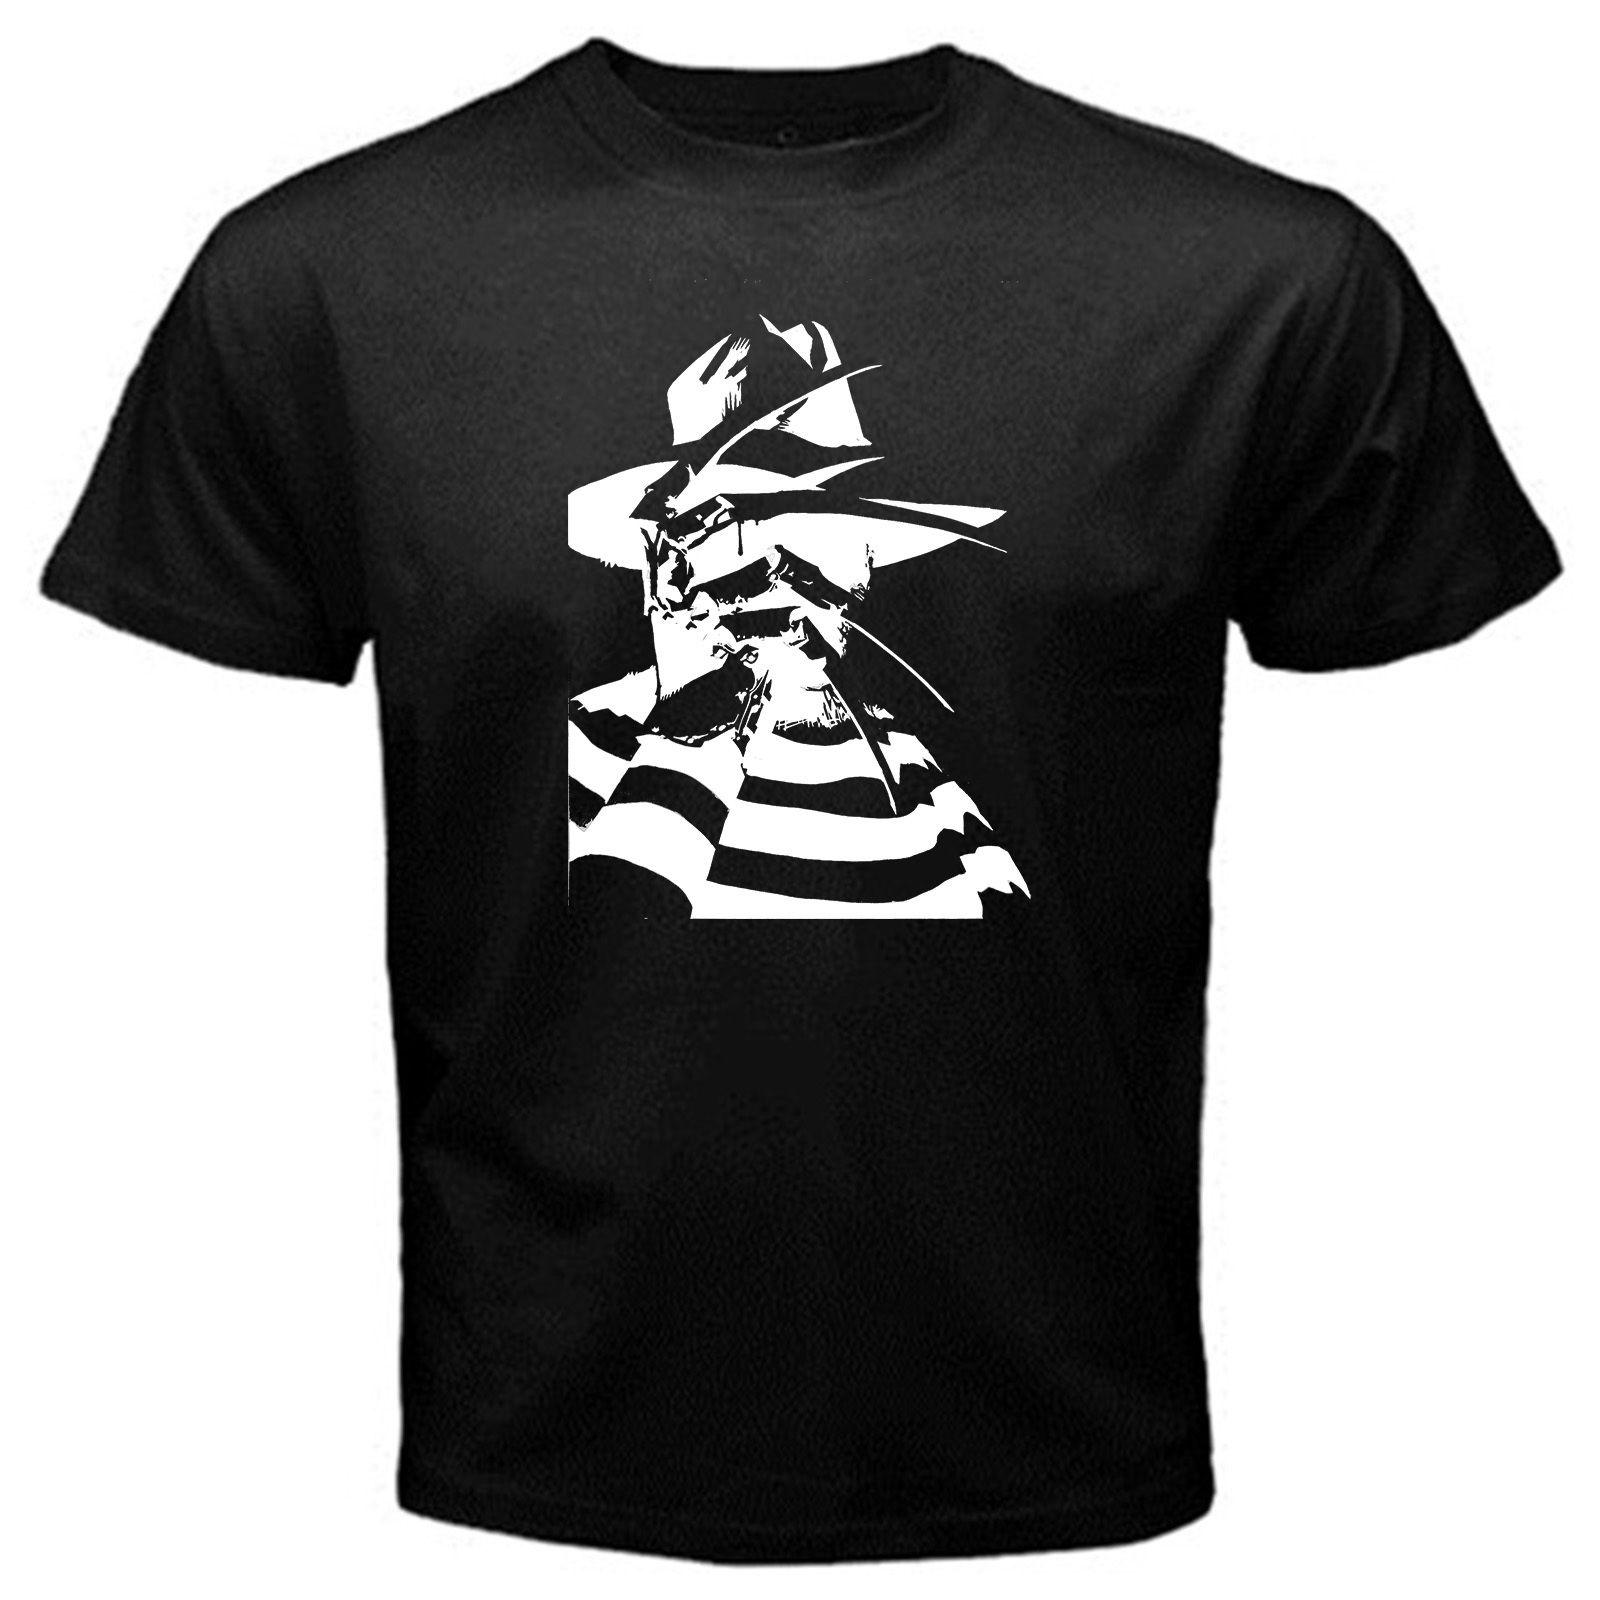 Freddy Friday 13Th Halloween Classic Creepy Clown Horror Moviet Shirt Black